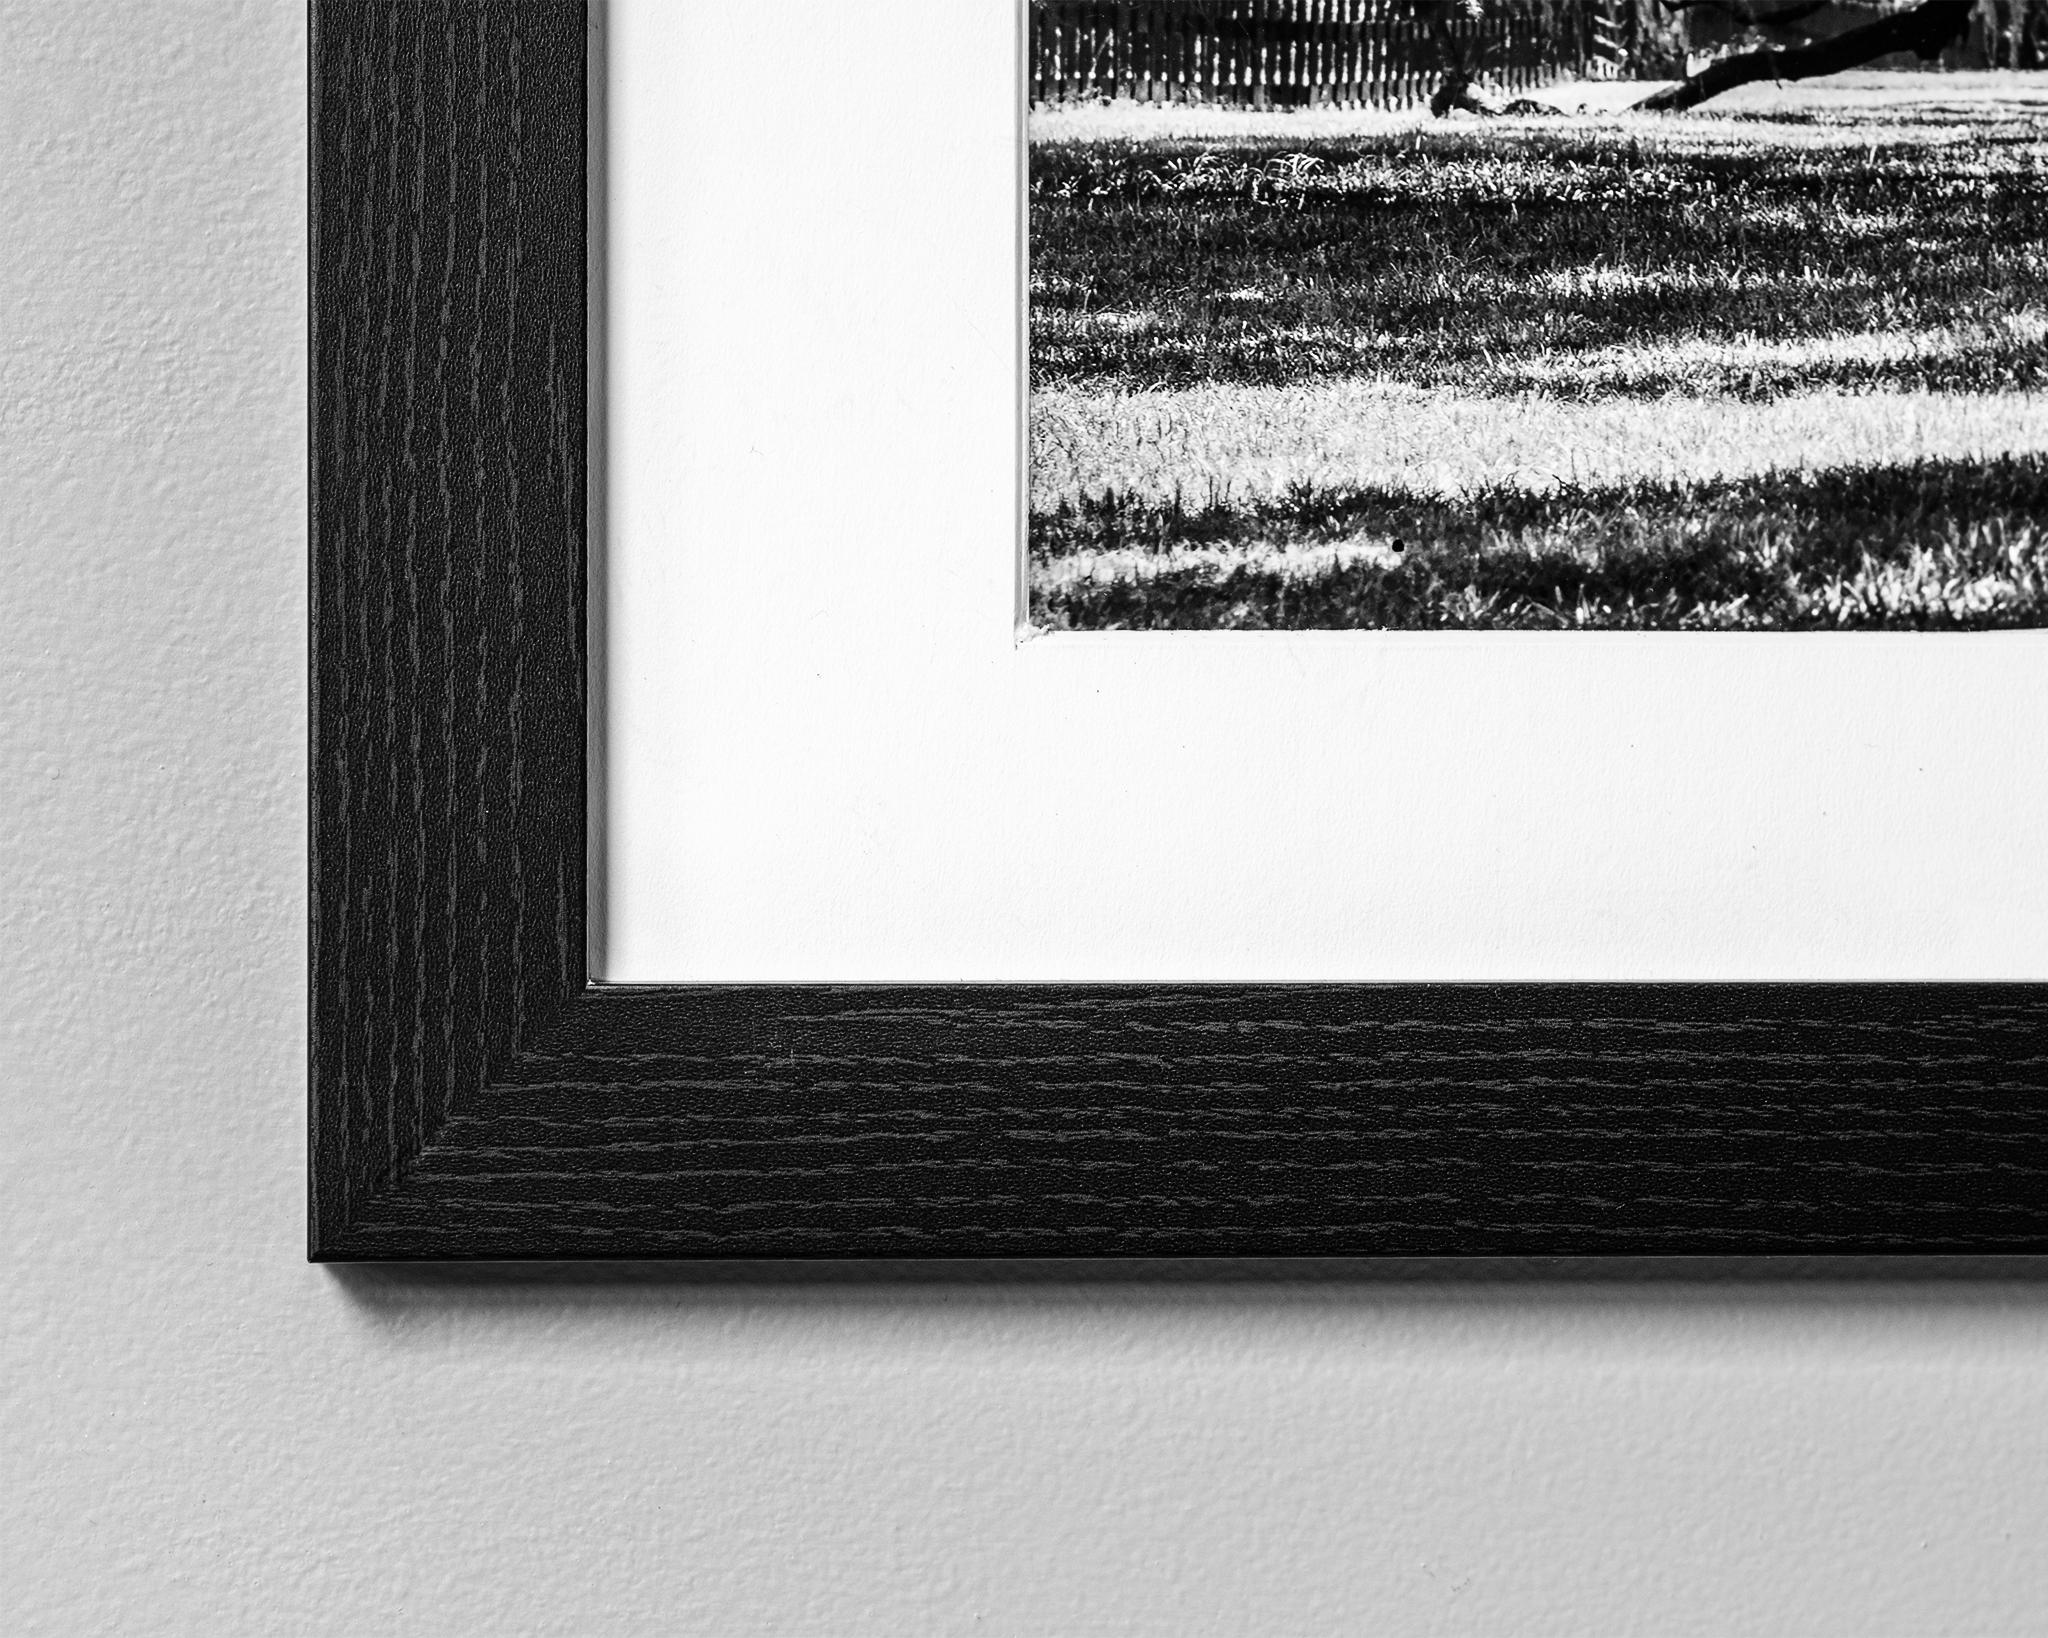 Black Maple Frame - Cody Schultz - Fine Art Nature Photography.jpg